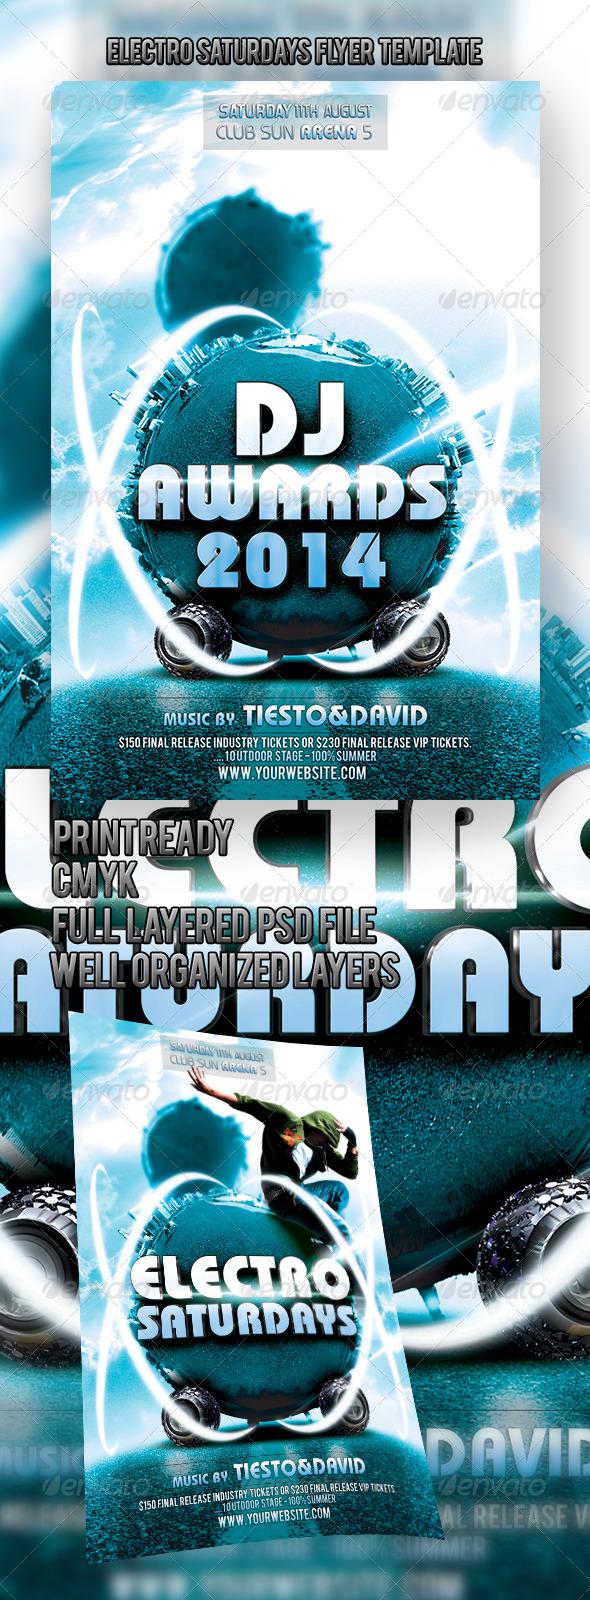 GraphicRiver Electro Saturdays Flyer Template 4618949